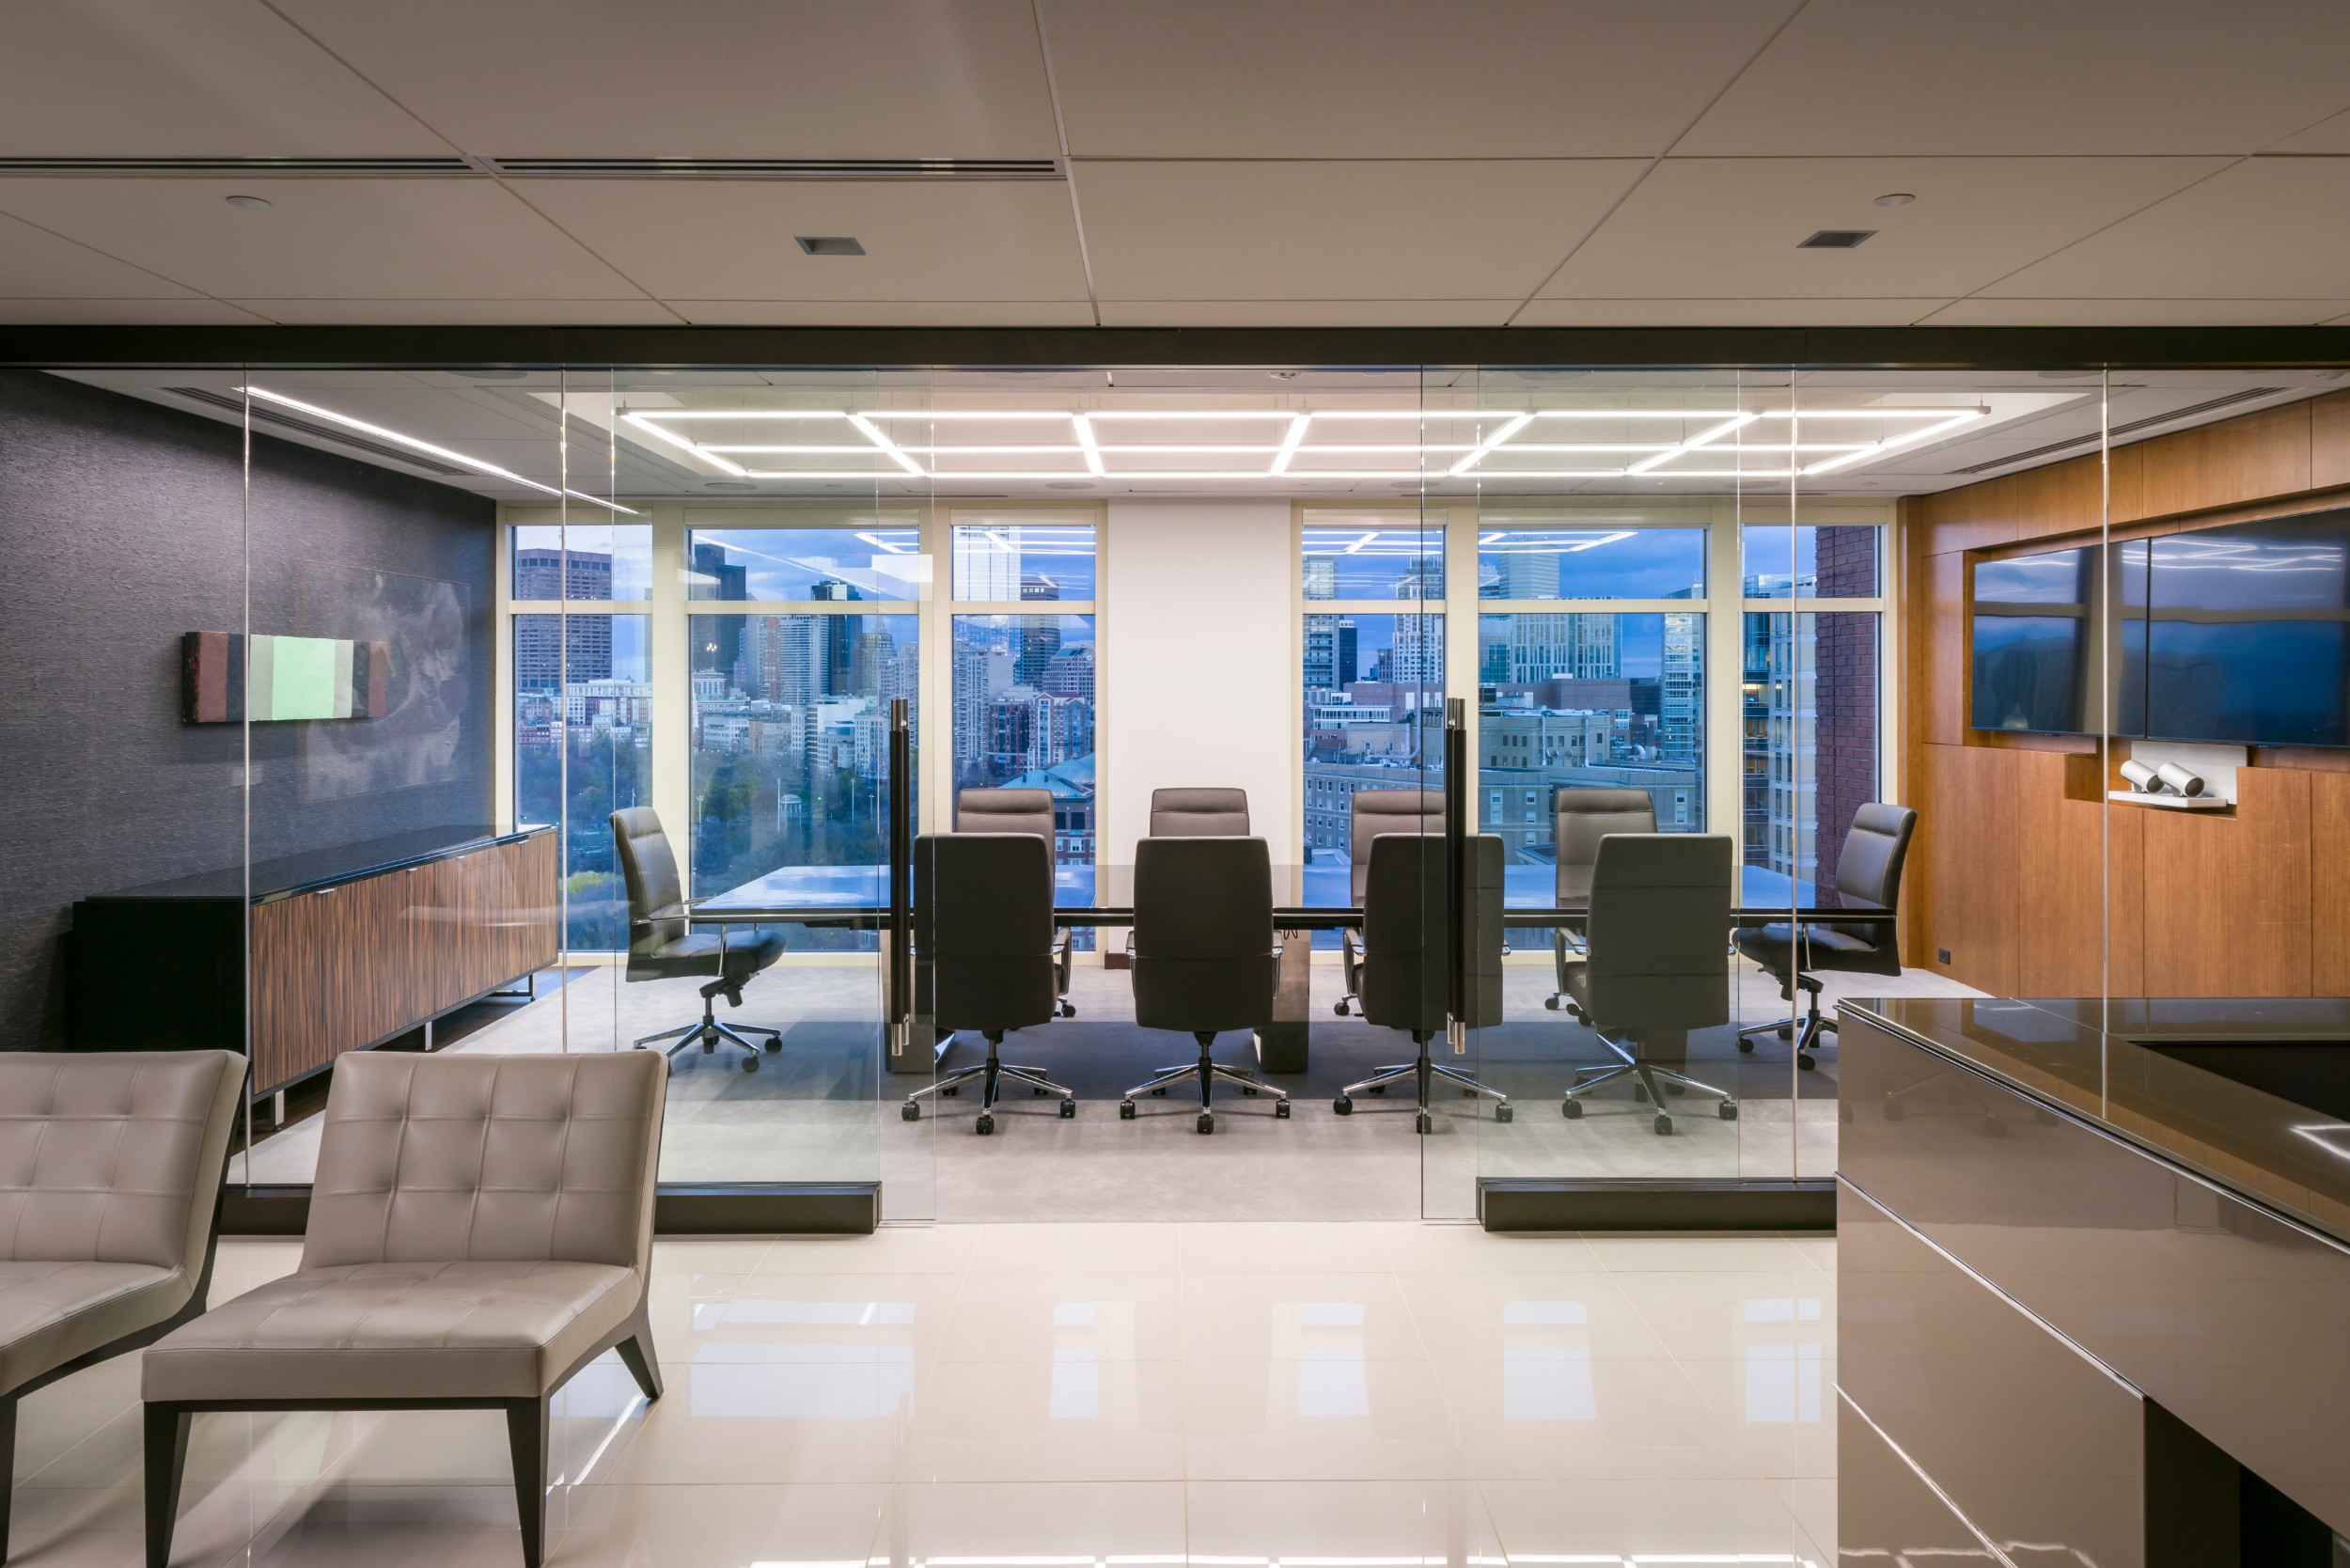 Corderman_Construction_Martignetti_Companies_Interior_Office_Buildout_Reception.jpg